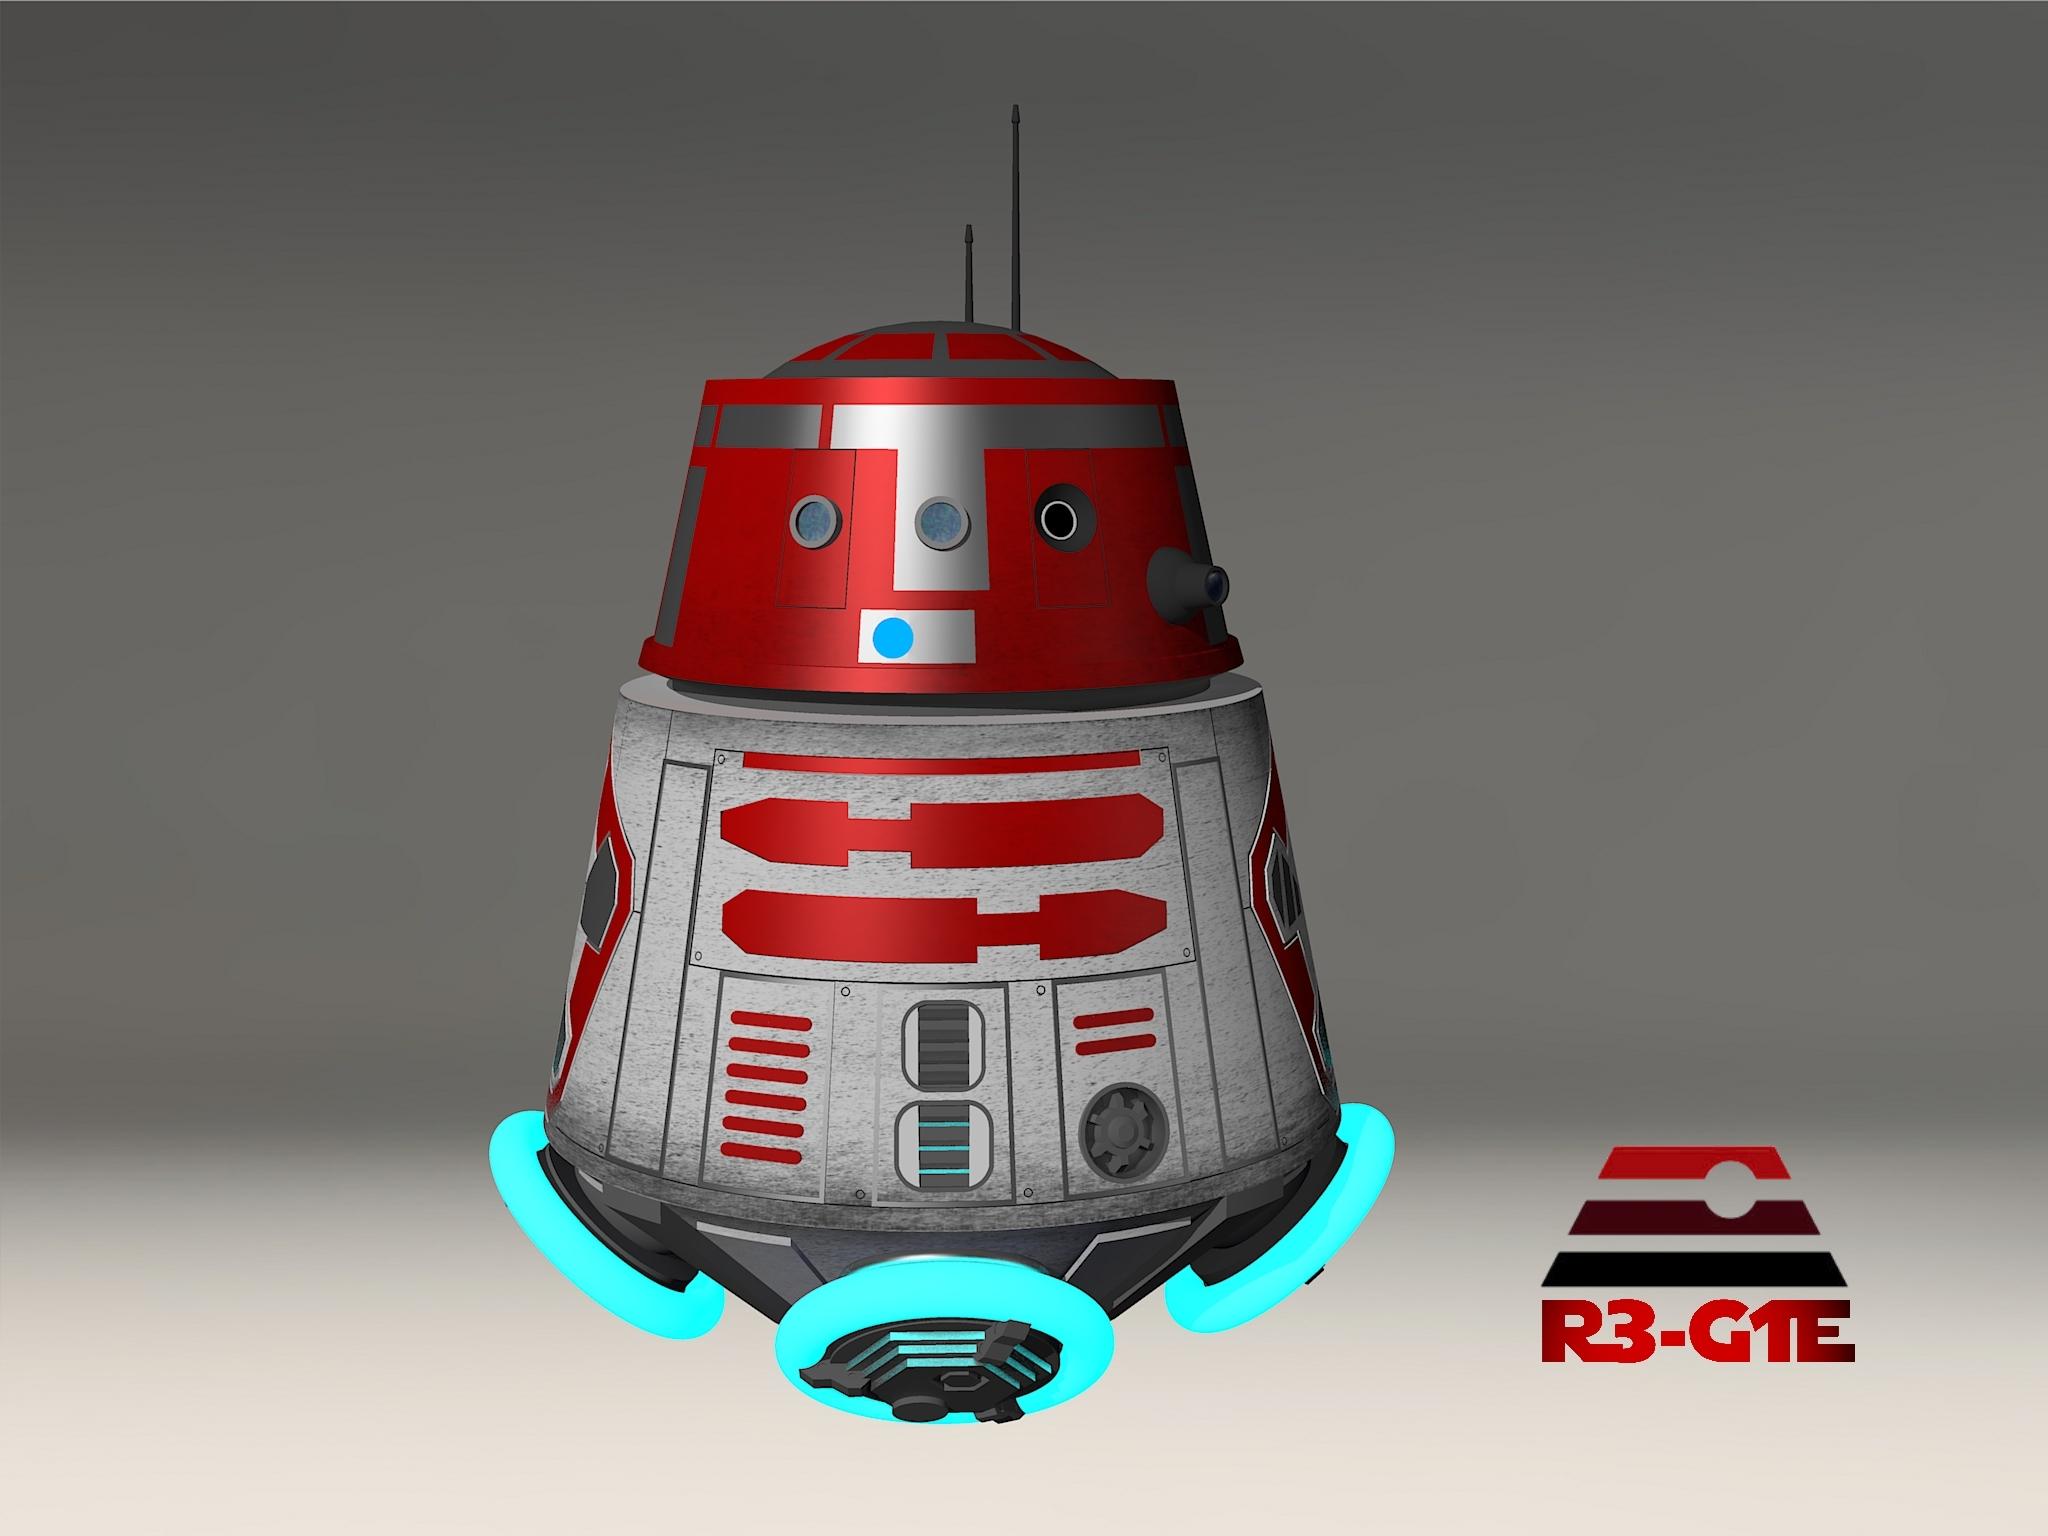 Star Wars Astromech Droid R3 G1e By Calamitysi On Deviantart